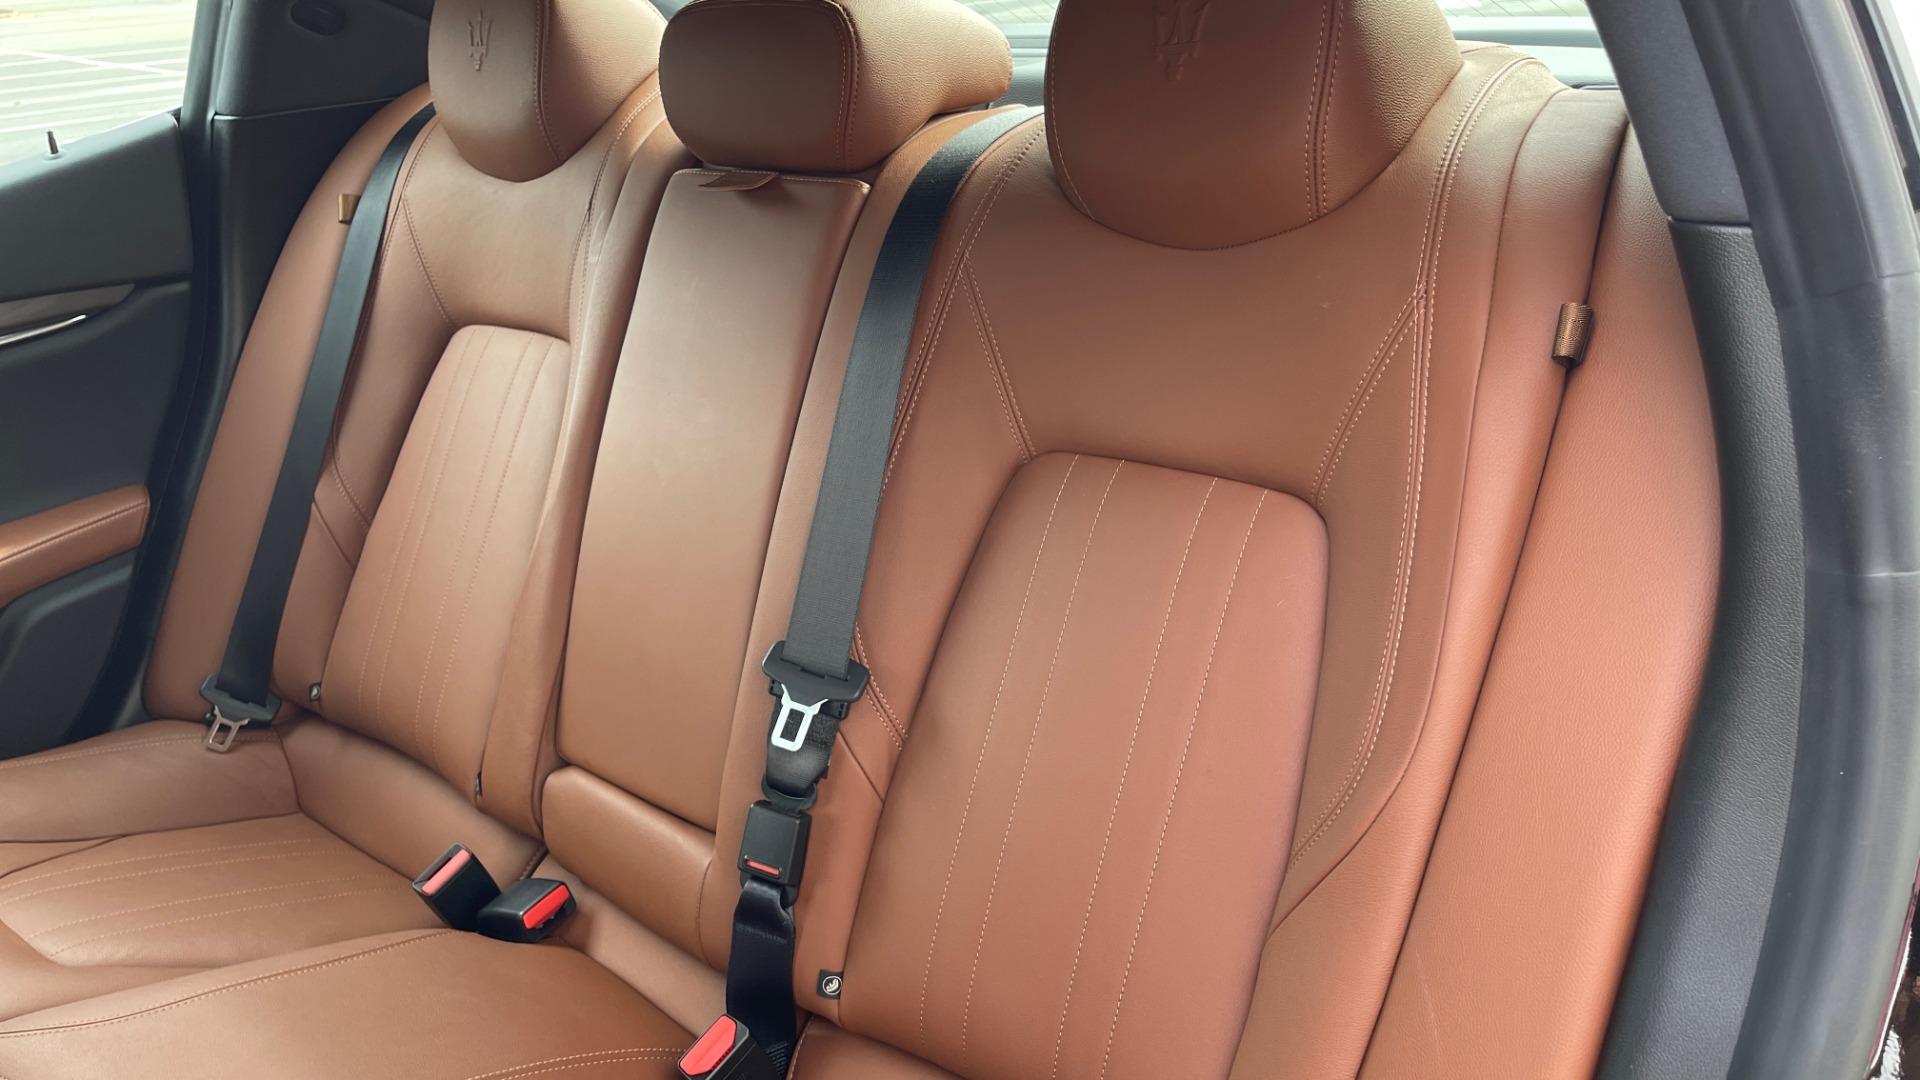 Used 2018 Maserati GHIBLI 3.0L SEDAN / 8-SPD AUTO / NAV / SUNROOF / REARVIEW for sale $42,995 at Formula Imports in Charlotte NC 28227 50